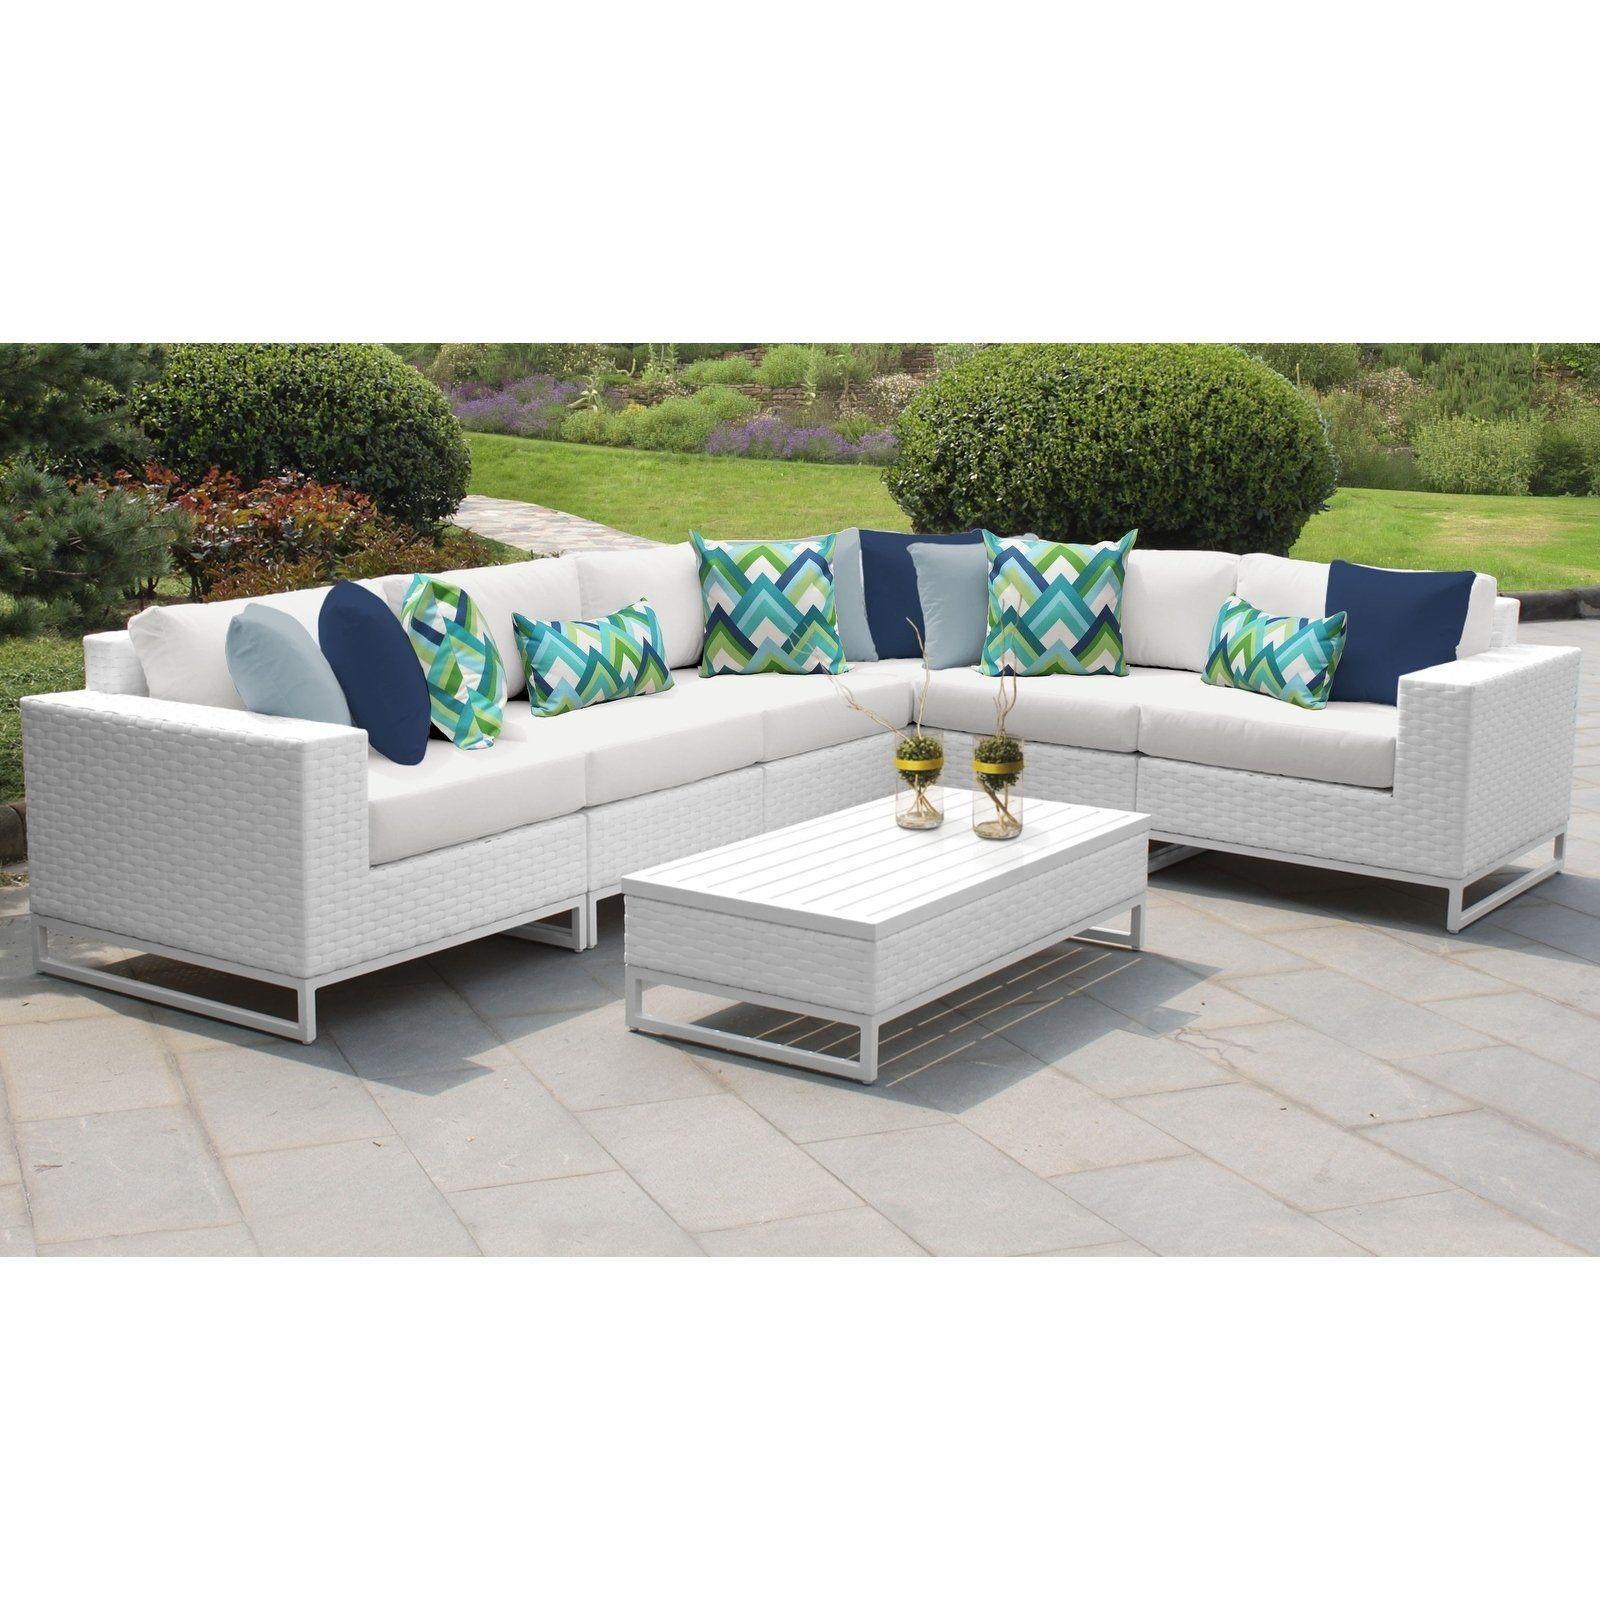 Miami 7 Piece Outdoor Wicker Patio Furniture Set 07g White Tk